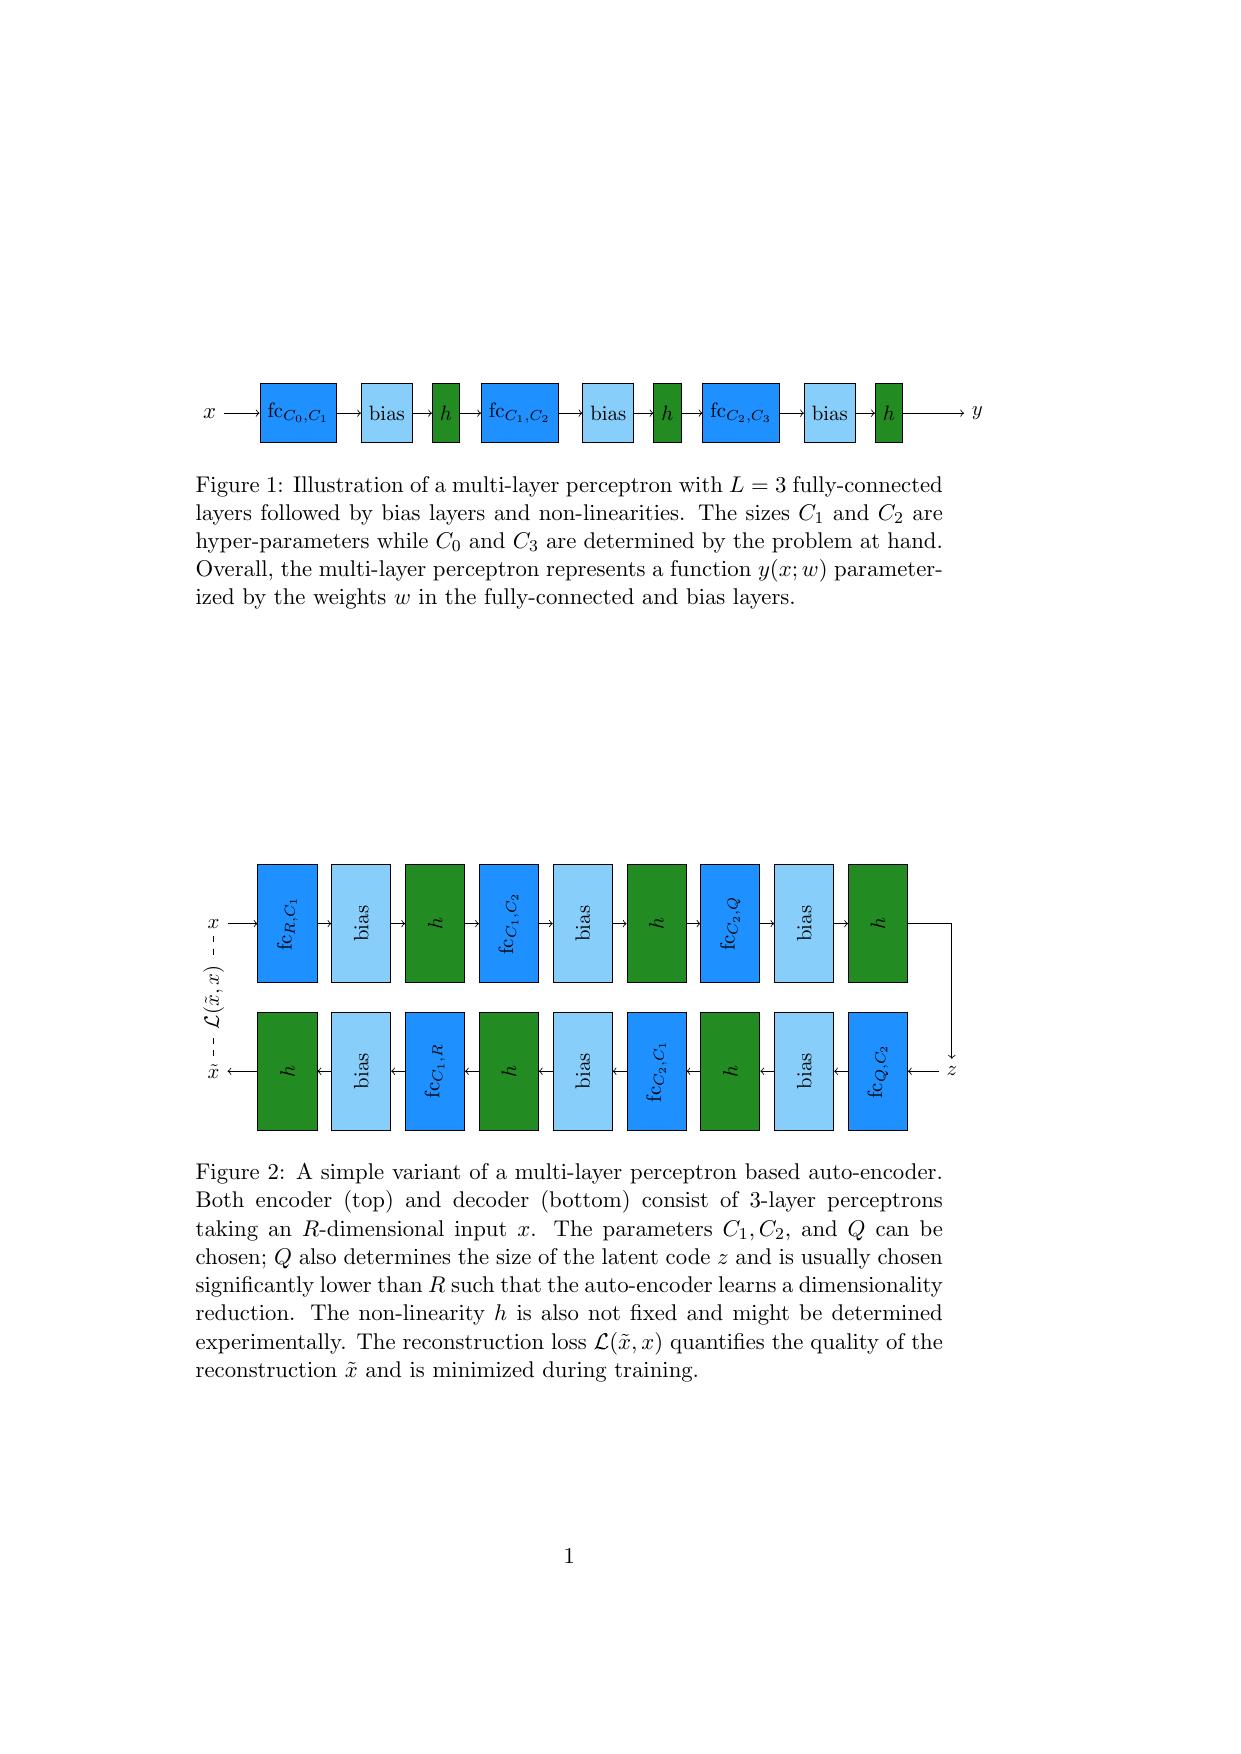 nn_encoder_2pages_3figs_+neuralnet